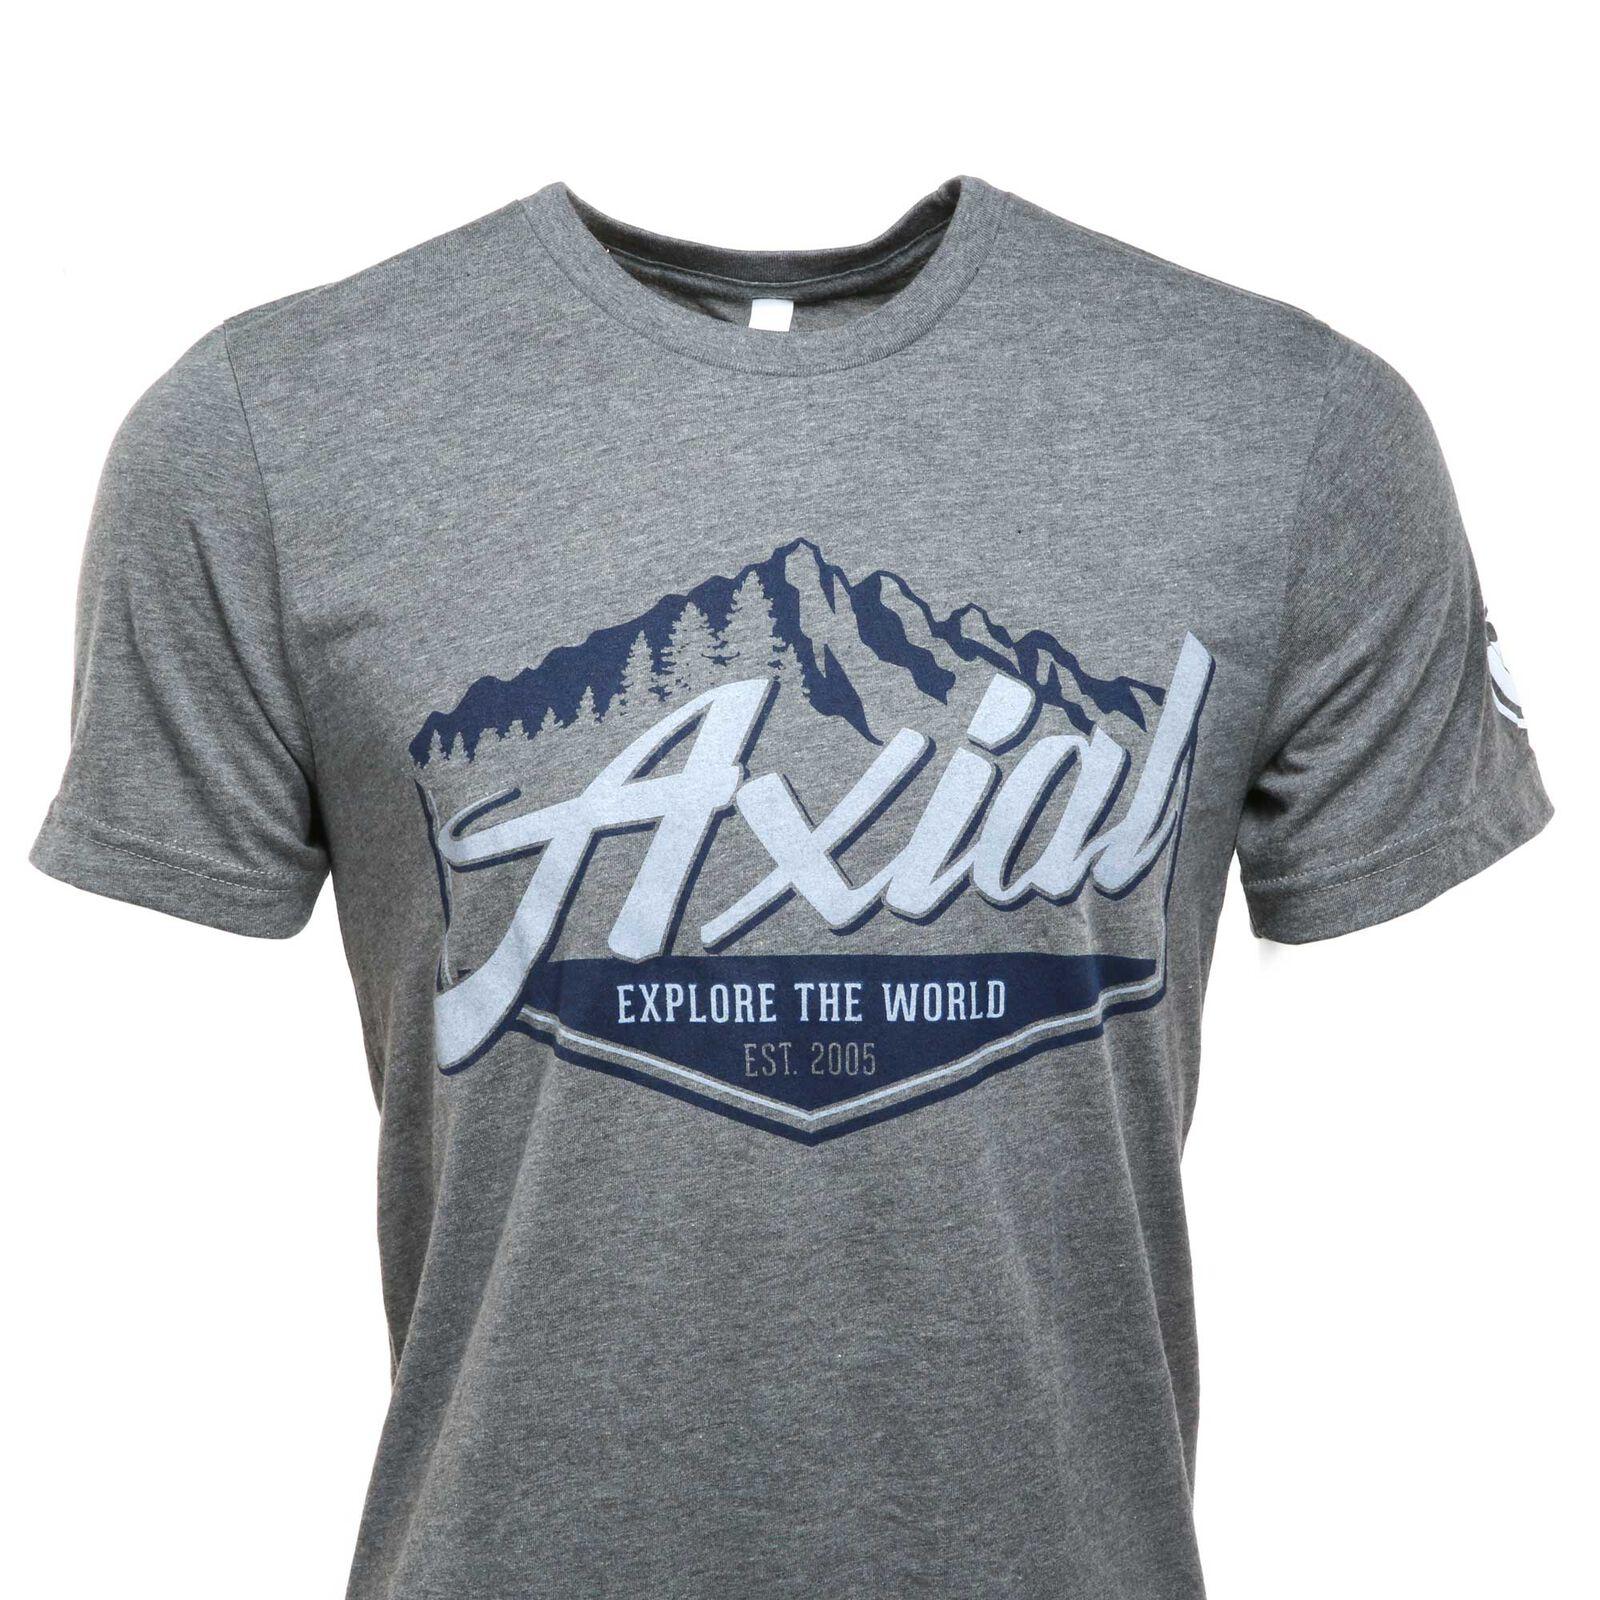 """Explore the World"" Shirt, Large"